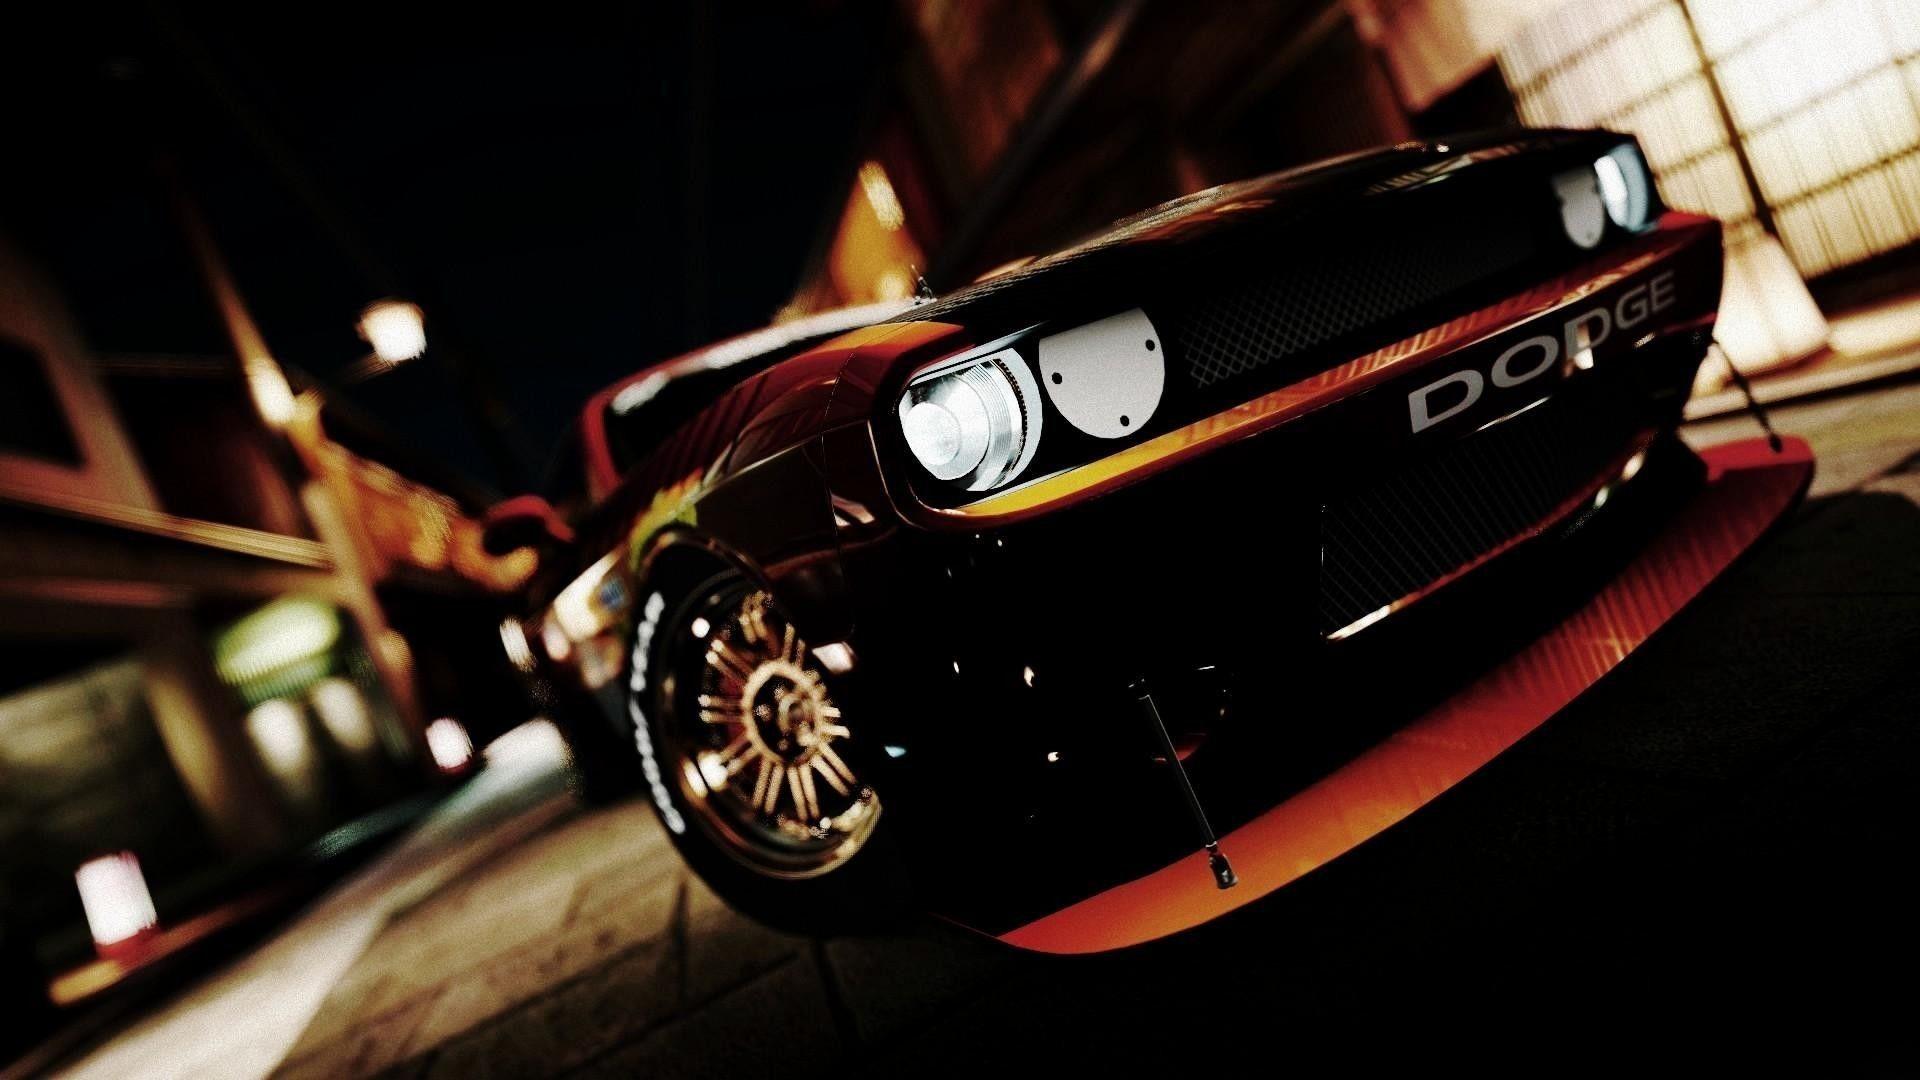 Beautiful Supra Hd Wallpaper Car Hd Car Wallpapers Cool Sports Cars